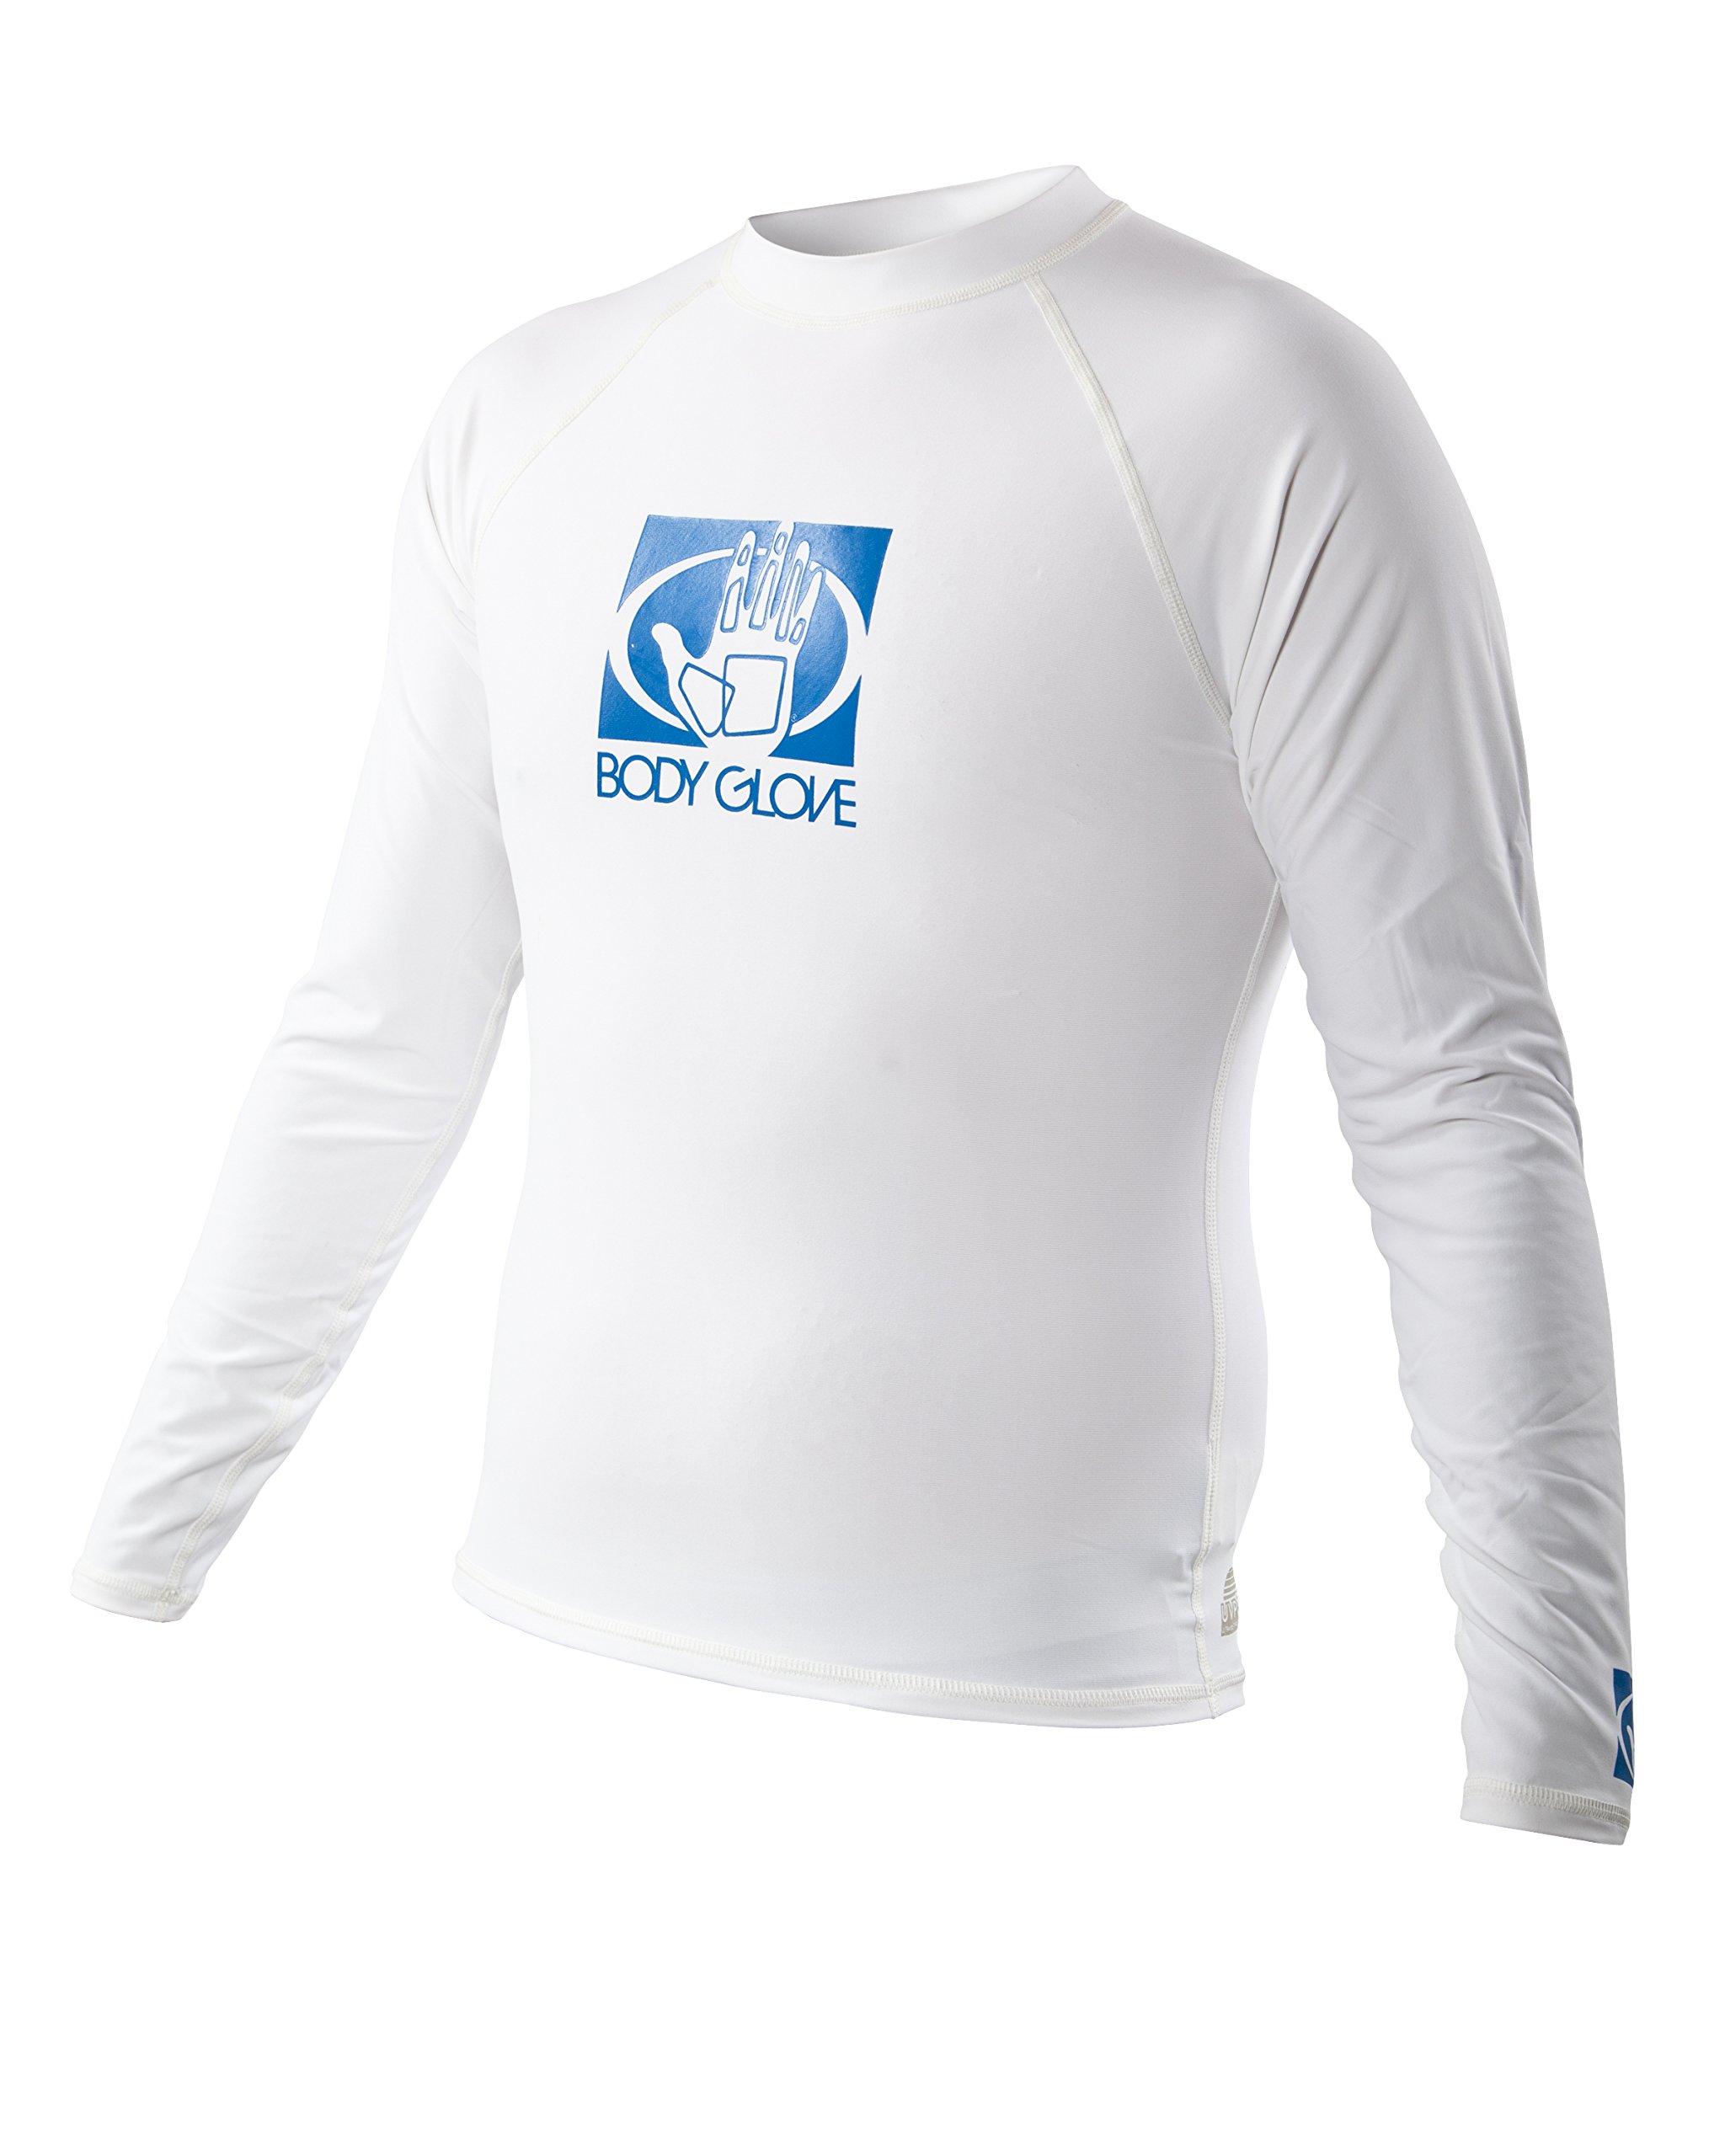 Body Glove Men's Basic Long Arm Rashguard, Small, White